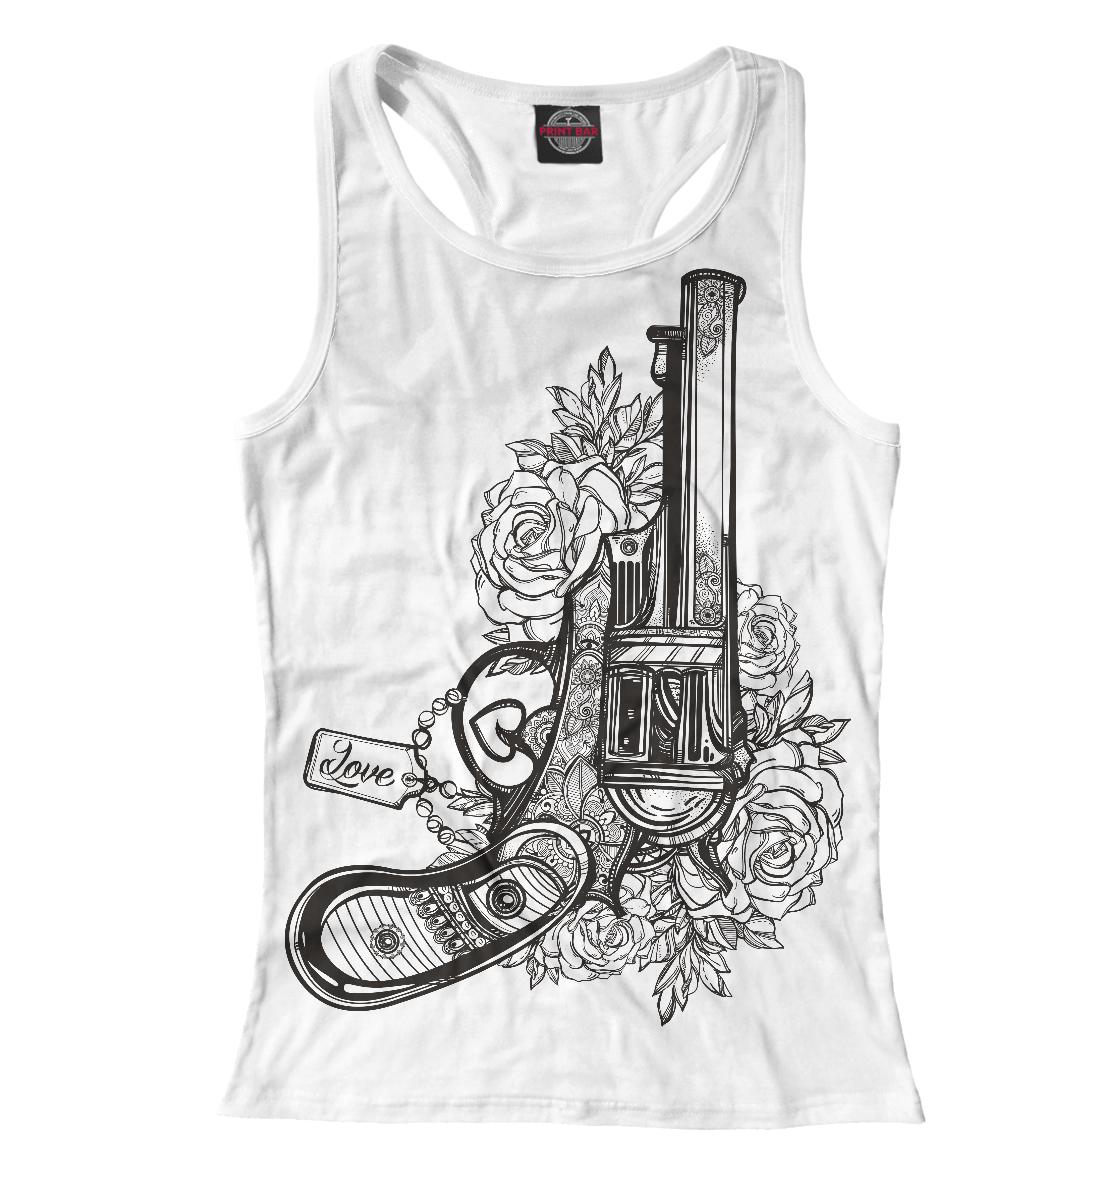 Купить Пистолет, Printbar, Майки борцовки, HIP-750717-mayb-1